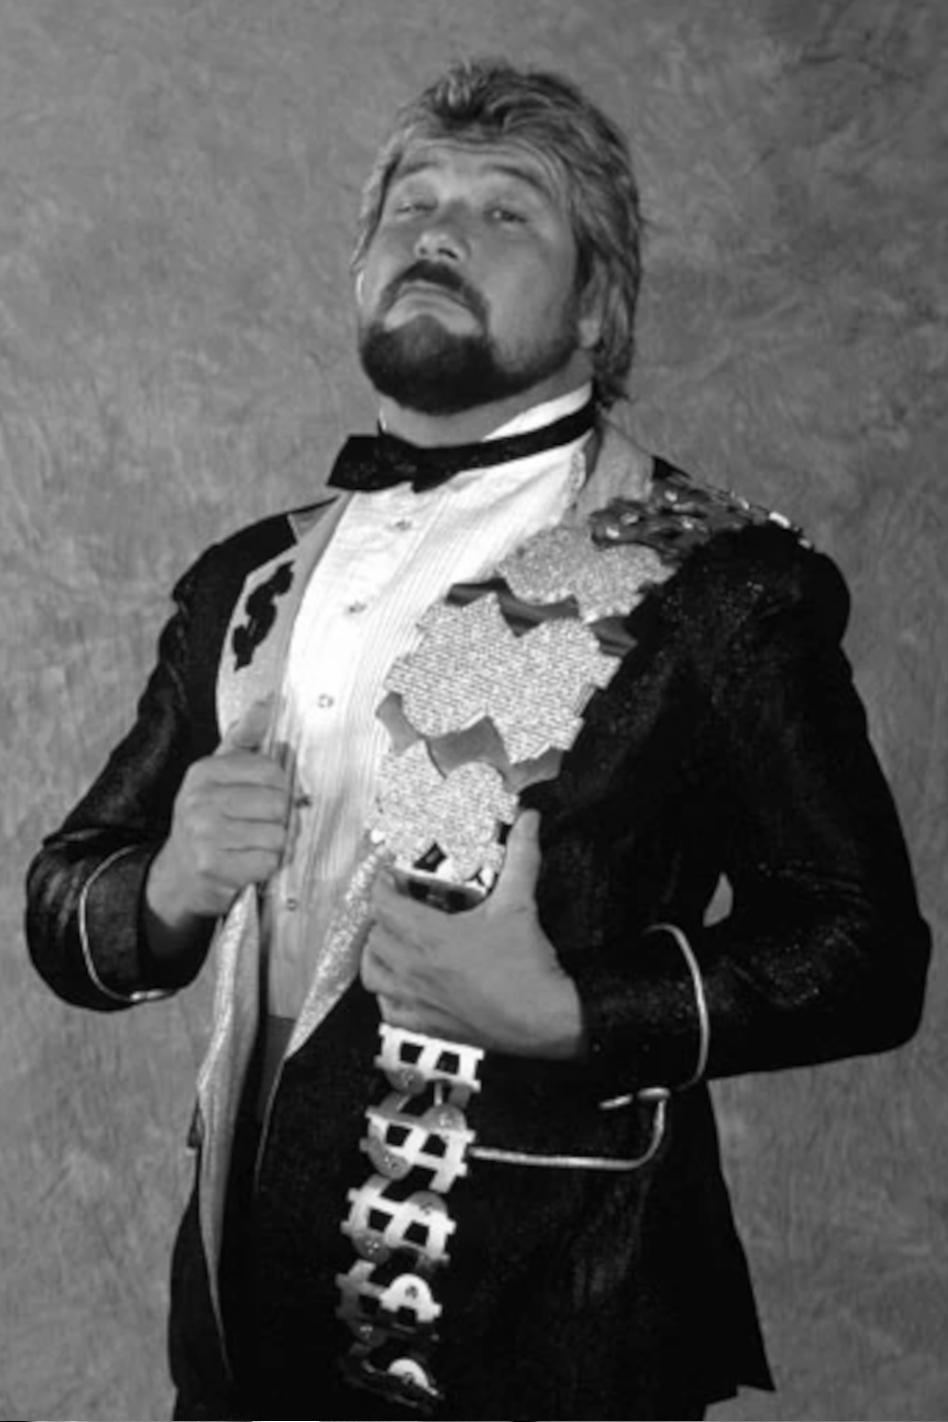 Wrestler Ted DiBiase